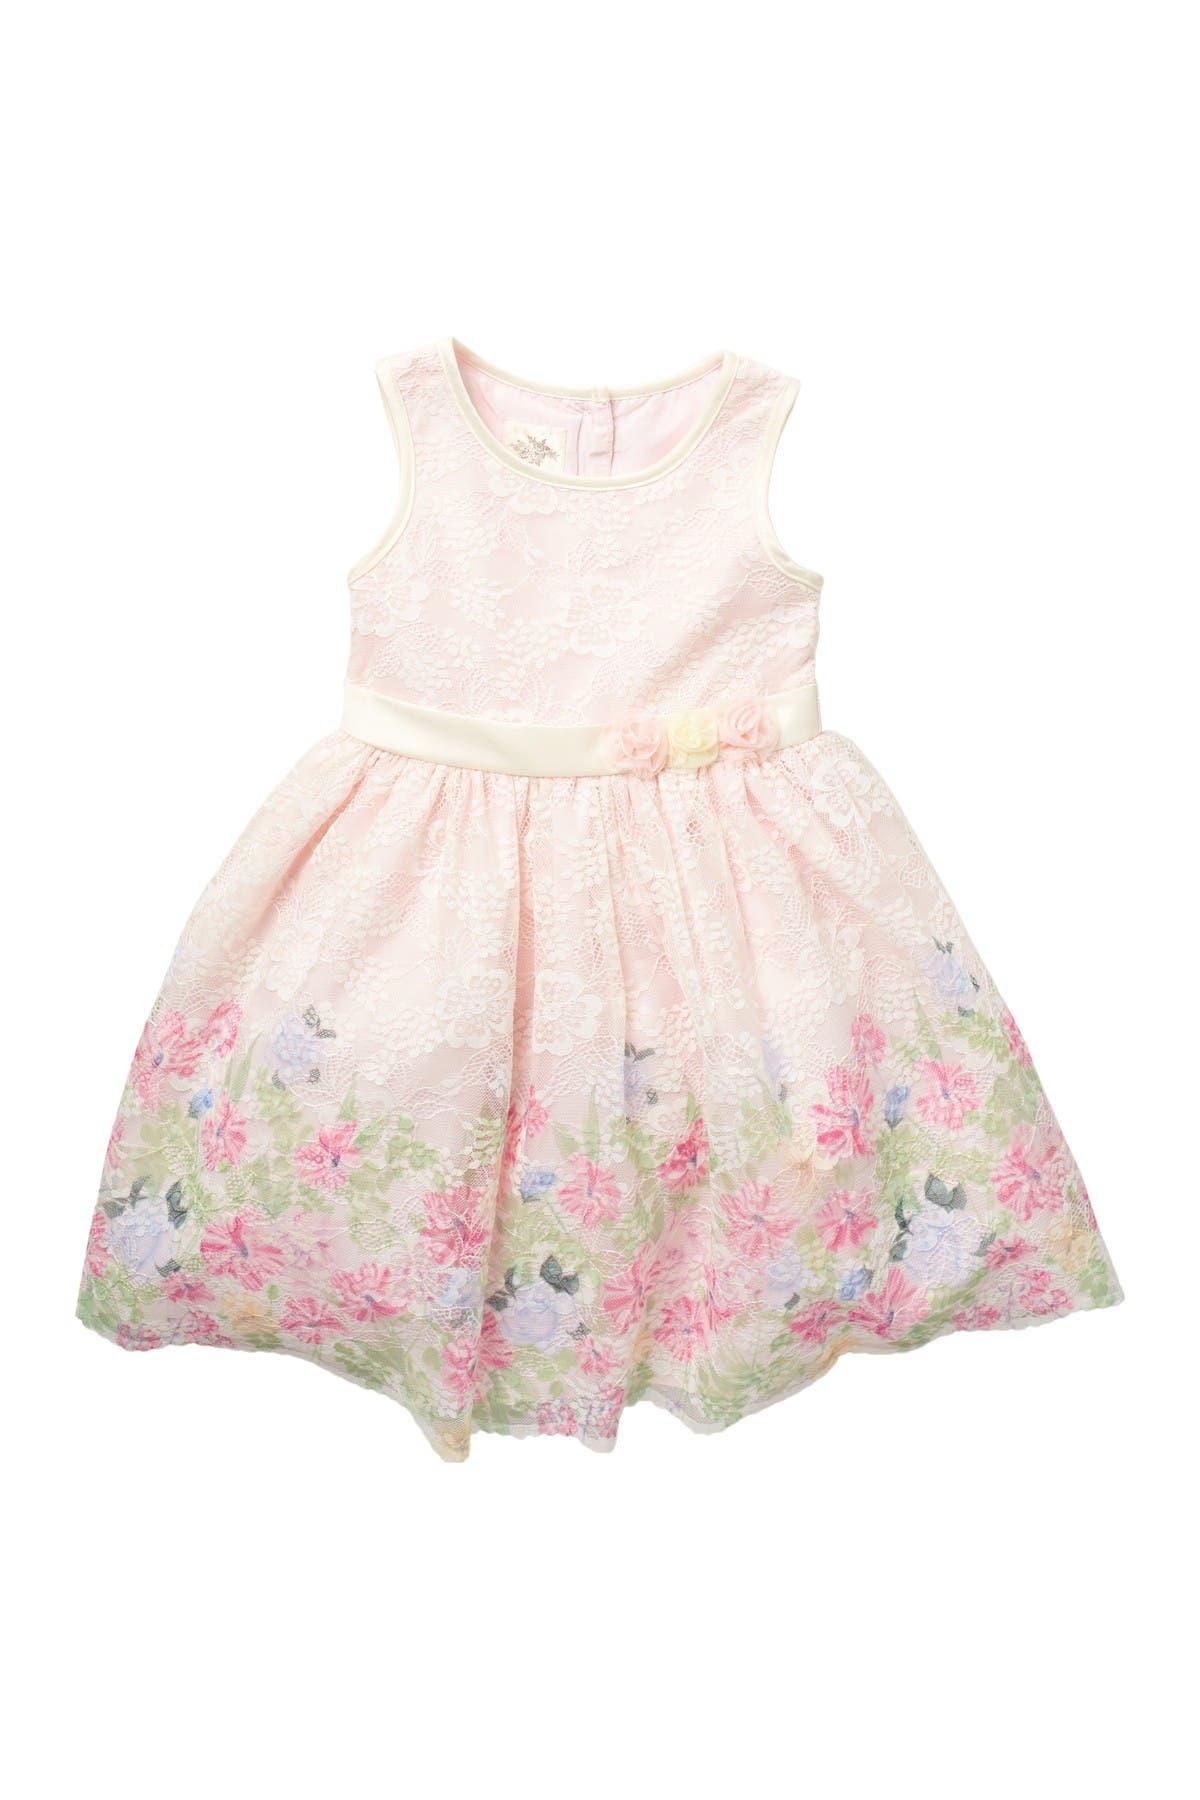 Image of Laura Ashley Floral Lace Sleeveless Dress